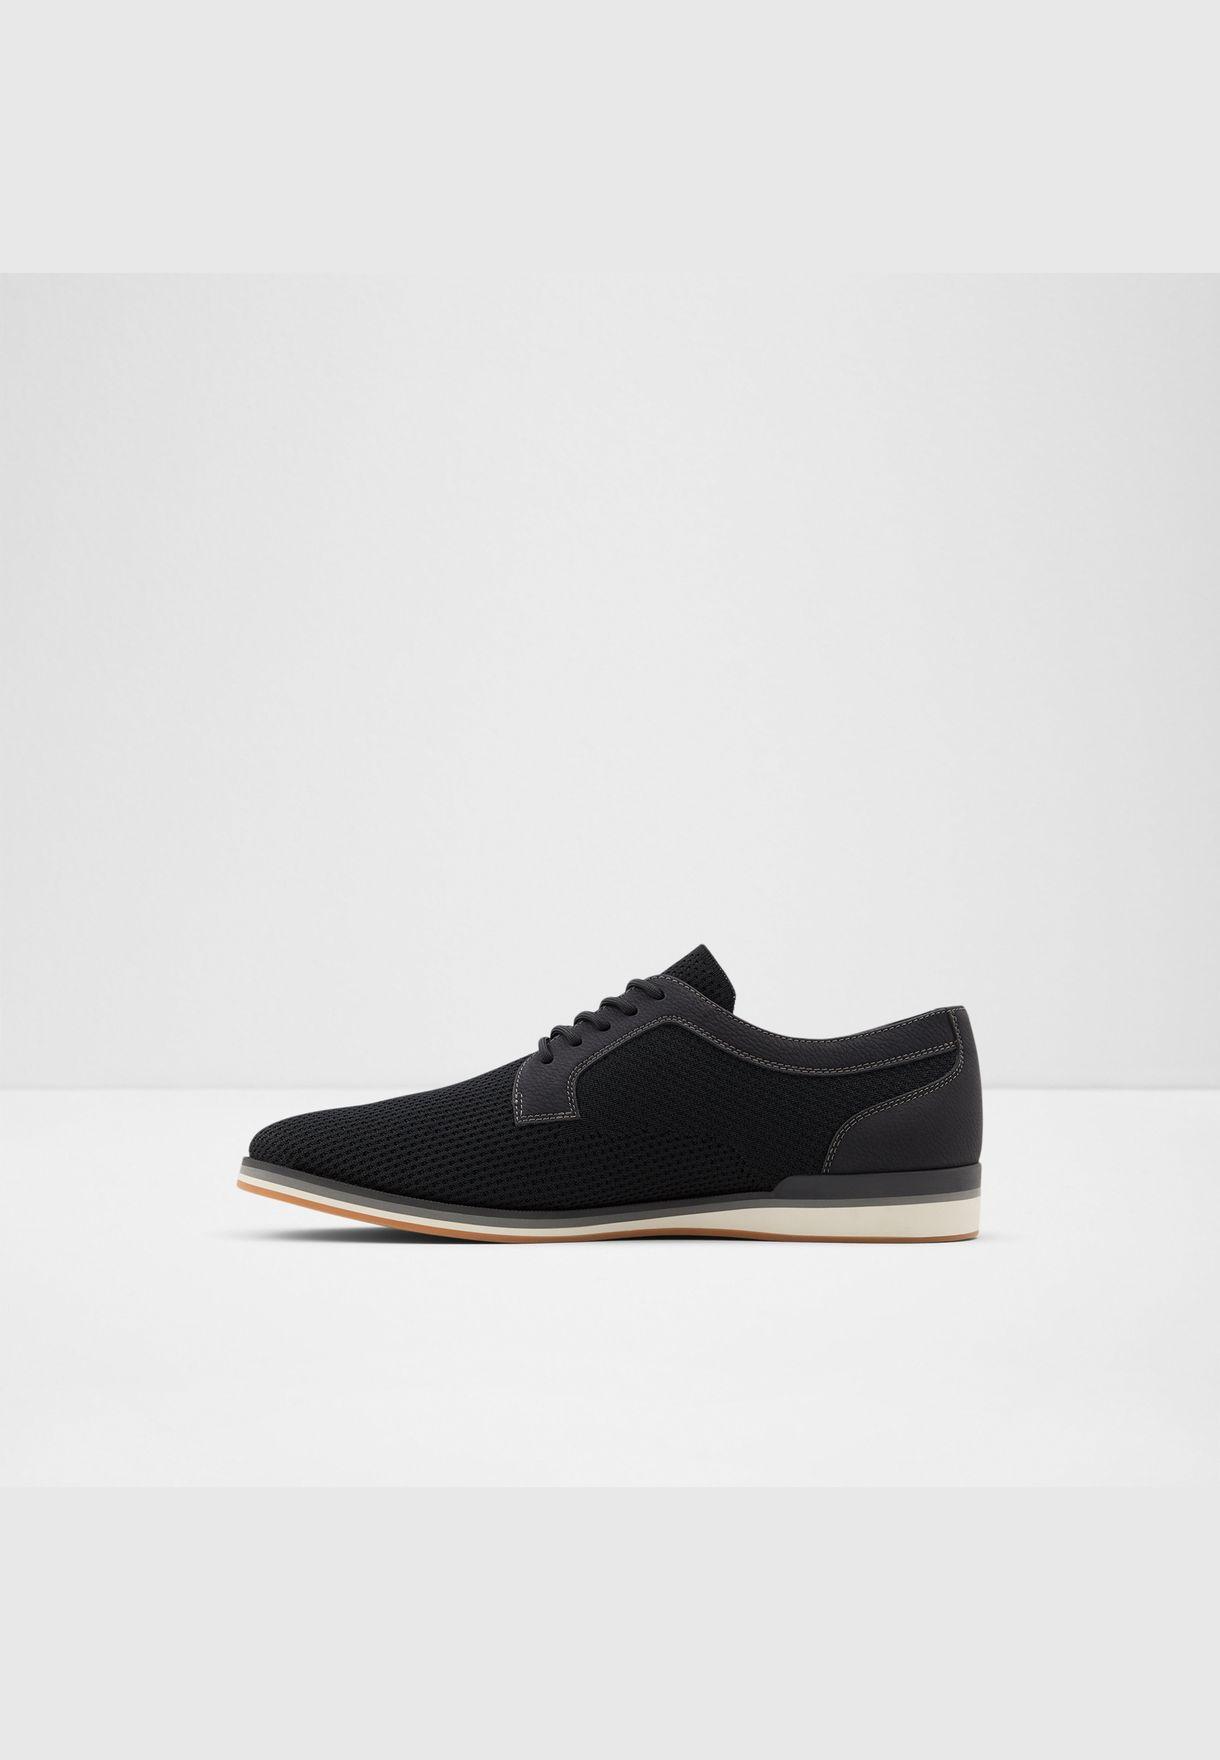 Fabric Shoes Flat Heel